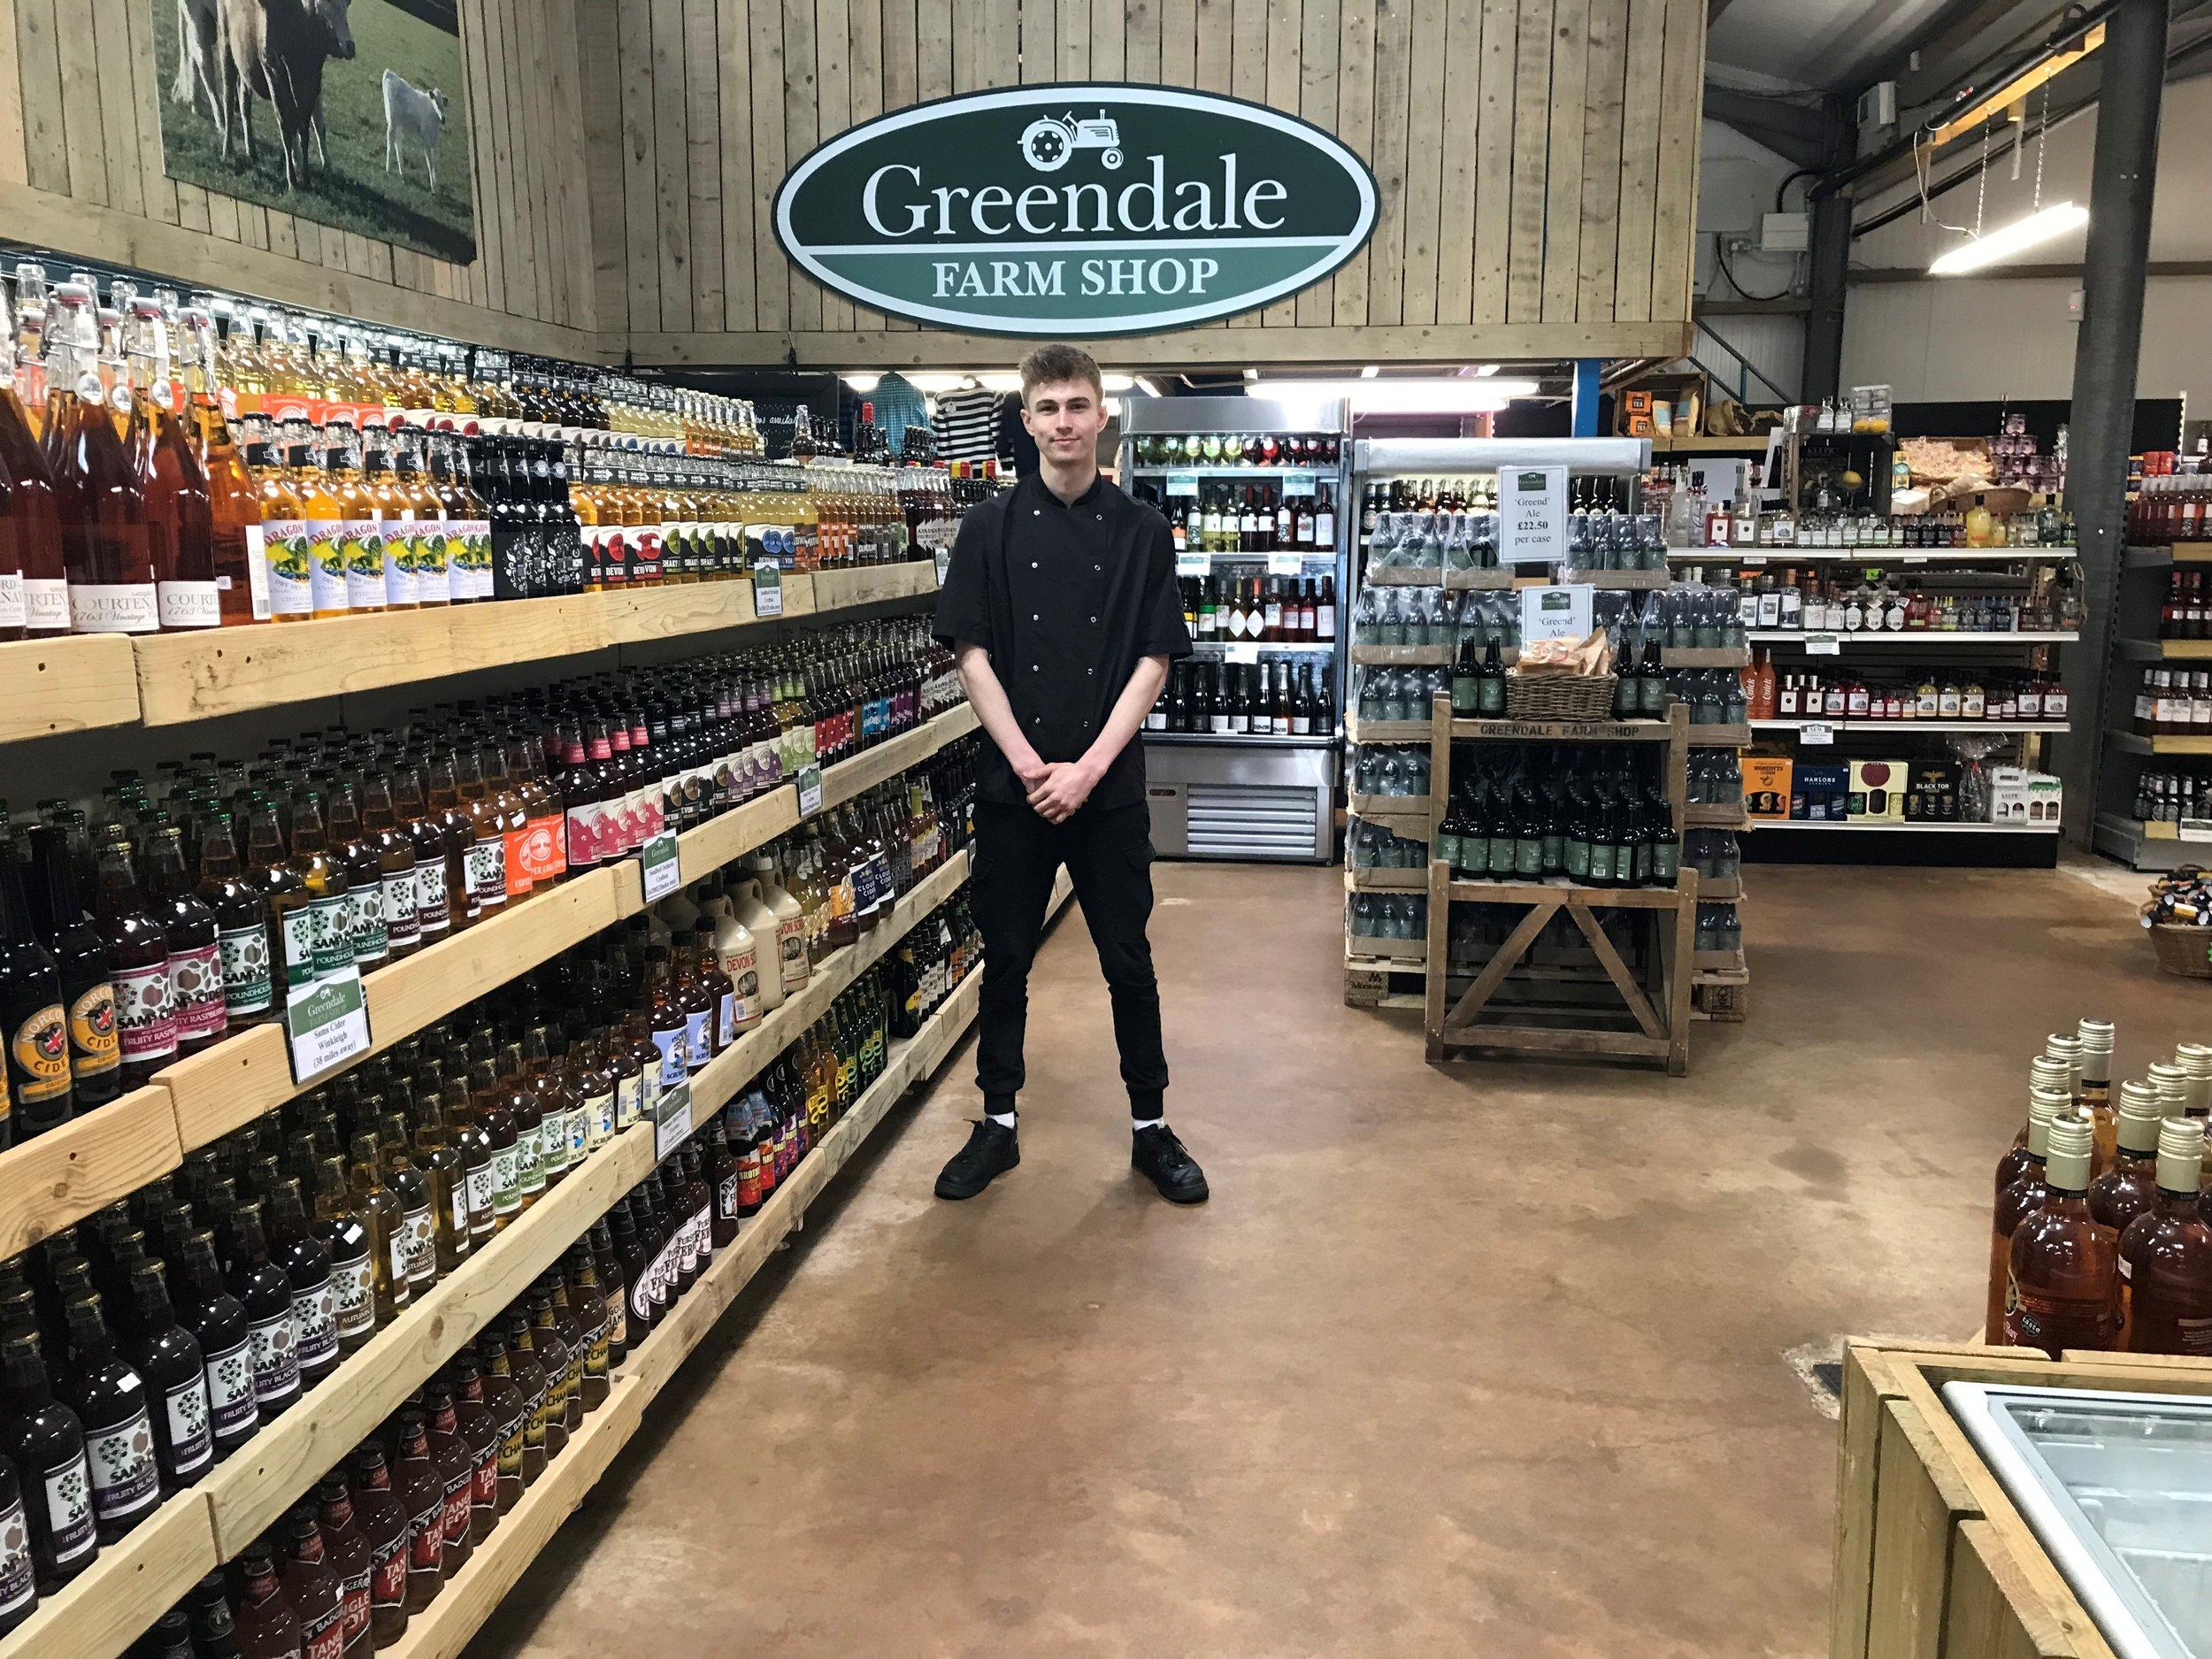 apprentice_greendale_farm_shop_1.jpg